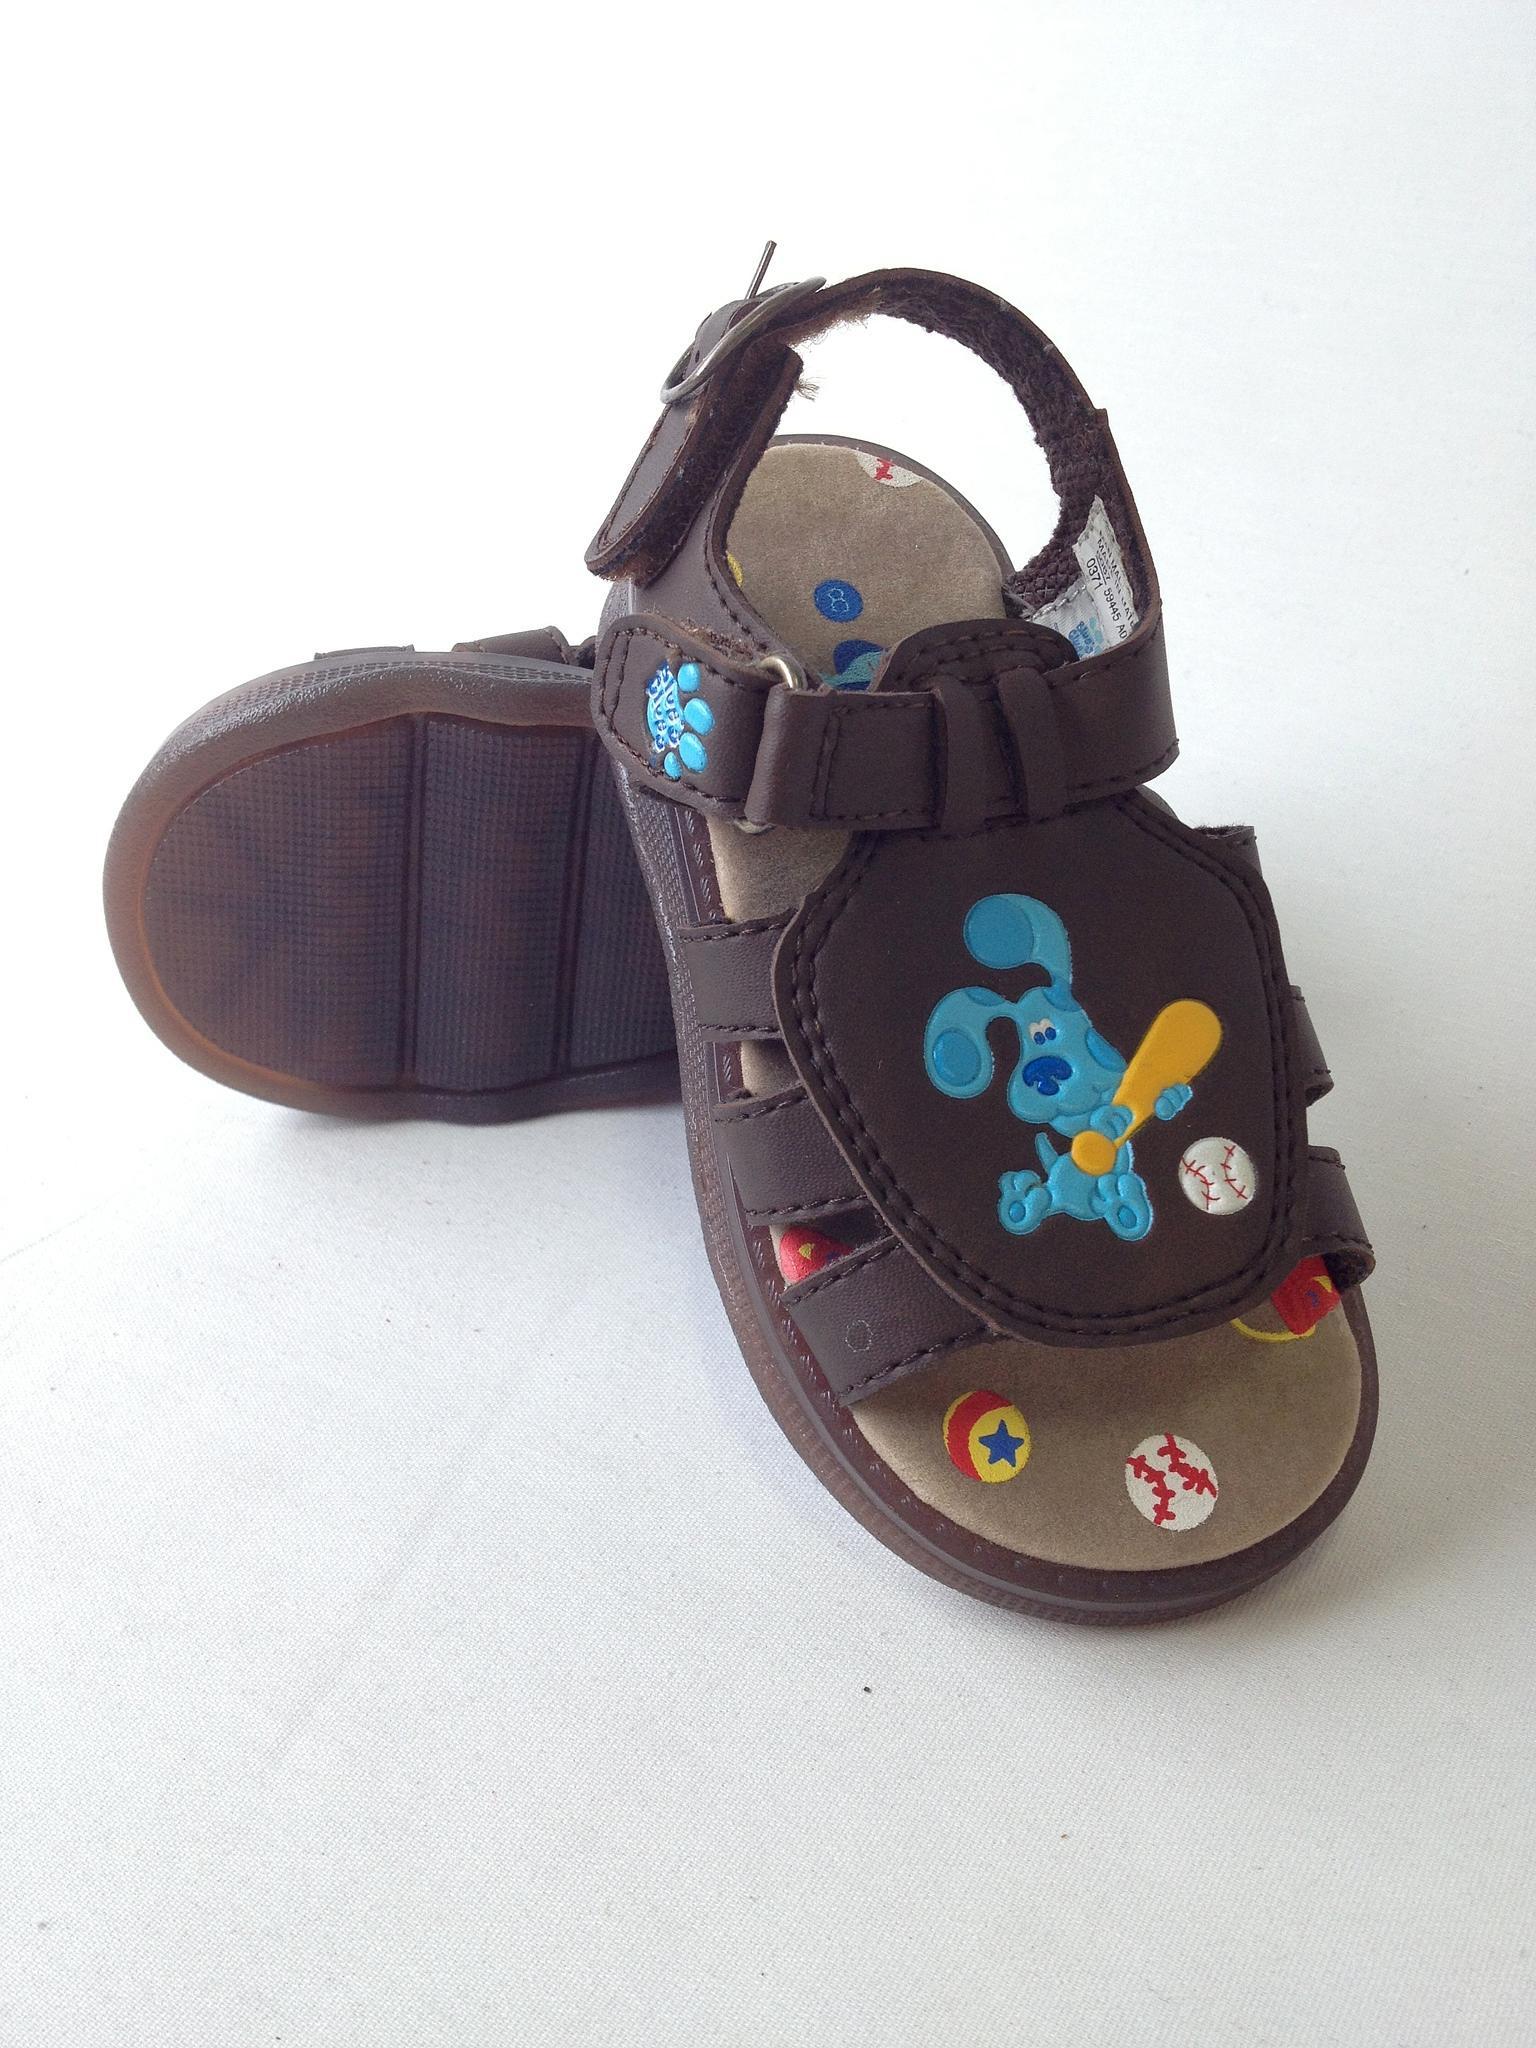 Blues Clues Shoes : blues, clues, shoes, Blue's, Clues, Sandals, ThredUP